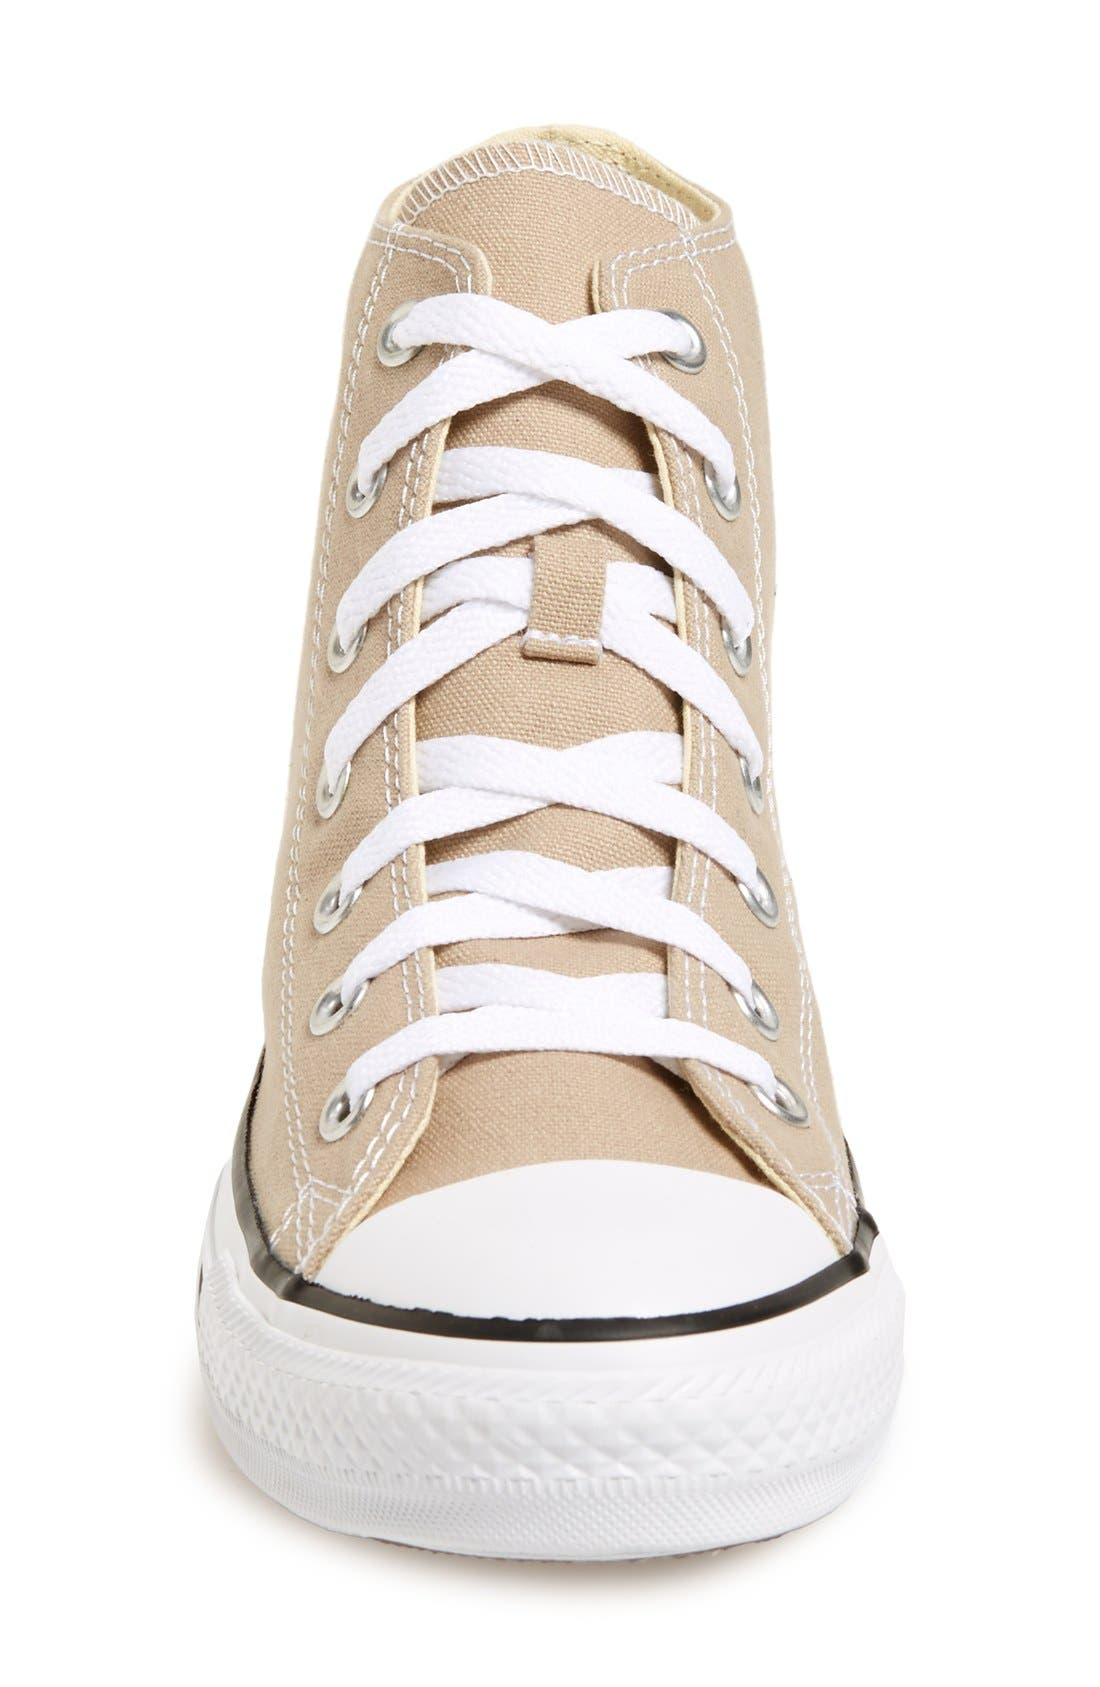 Alternate Image 3  - Converse Chuck Taylor® All Star®' Seasonal' High Top Sneaker (Women)